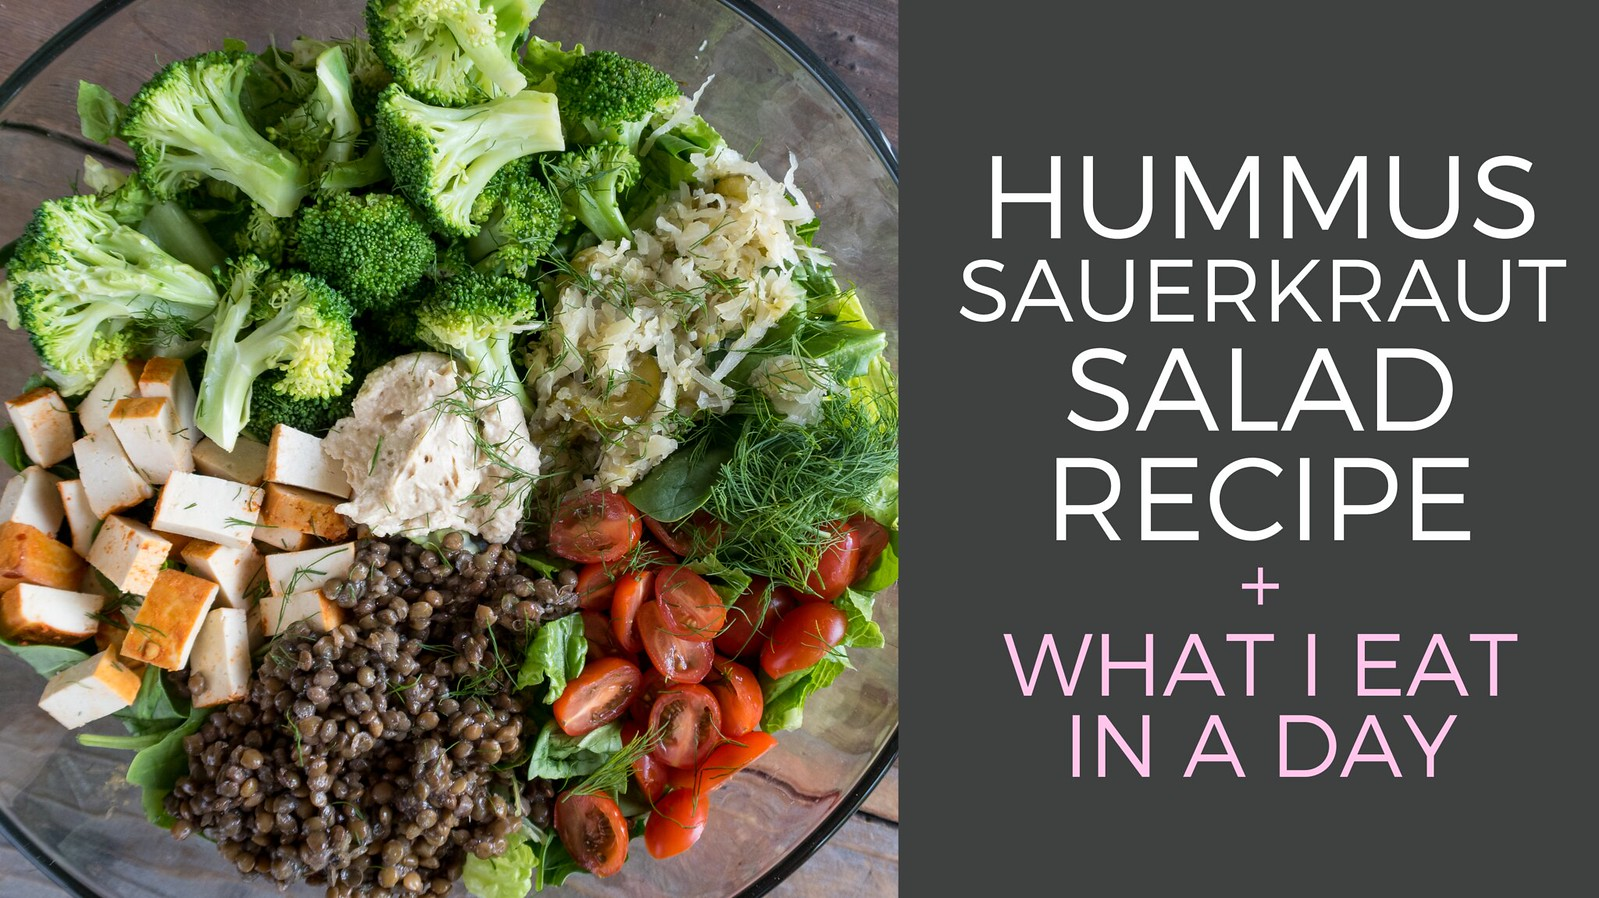 Easy Hummus Sauerkraut Salad sweetsimplevegan.com